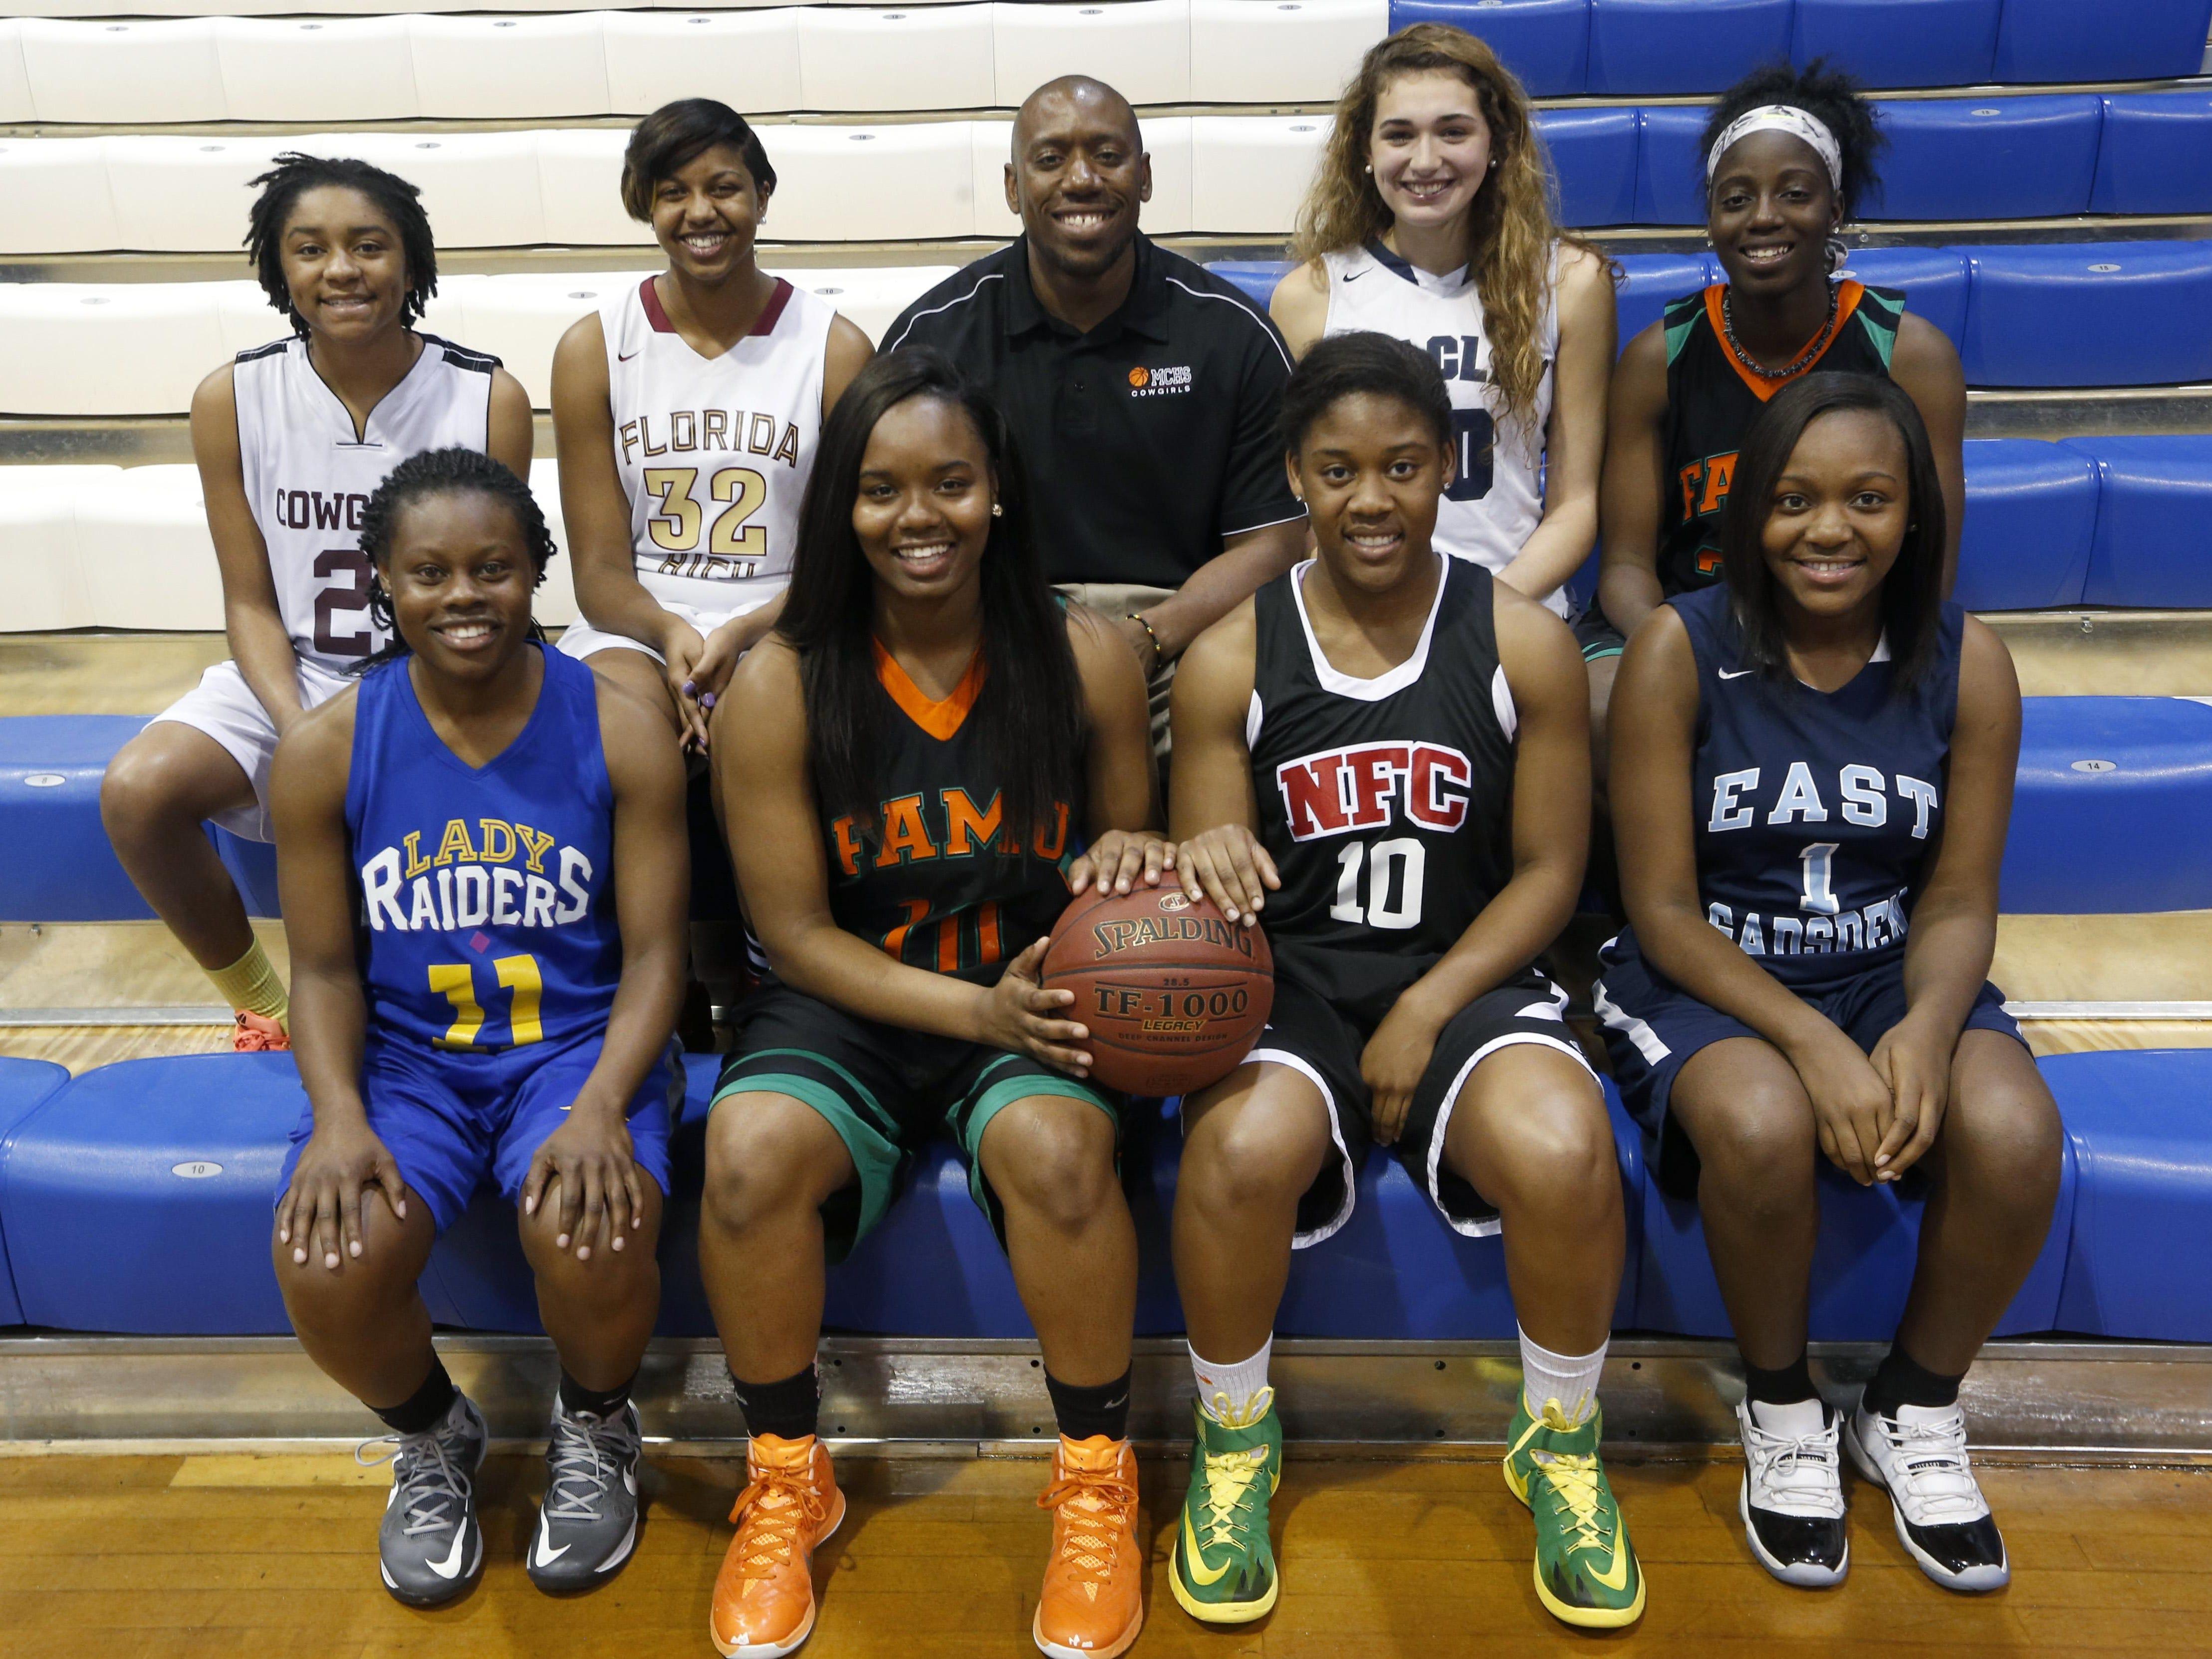 2014-15 All-Big Bend girls basketball first team. Front row, L-R: Jazmine Harris (Rickards), Ja'Nyia McNealy (FAMU DRS), Rosanna Jenije (NFC), Dondrea Harris (East Gadsden) Back row, from left: Jameica Cobb (Madison County), Shakeriah Carter (Florida High), Madison County coach Marcus Hawkins, Hannah Schuchts (Maclay), Jazmine Jones (FAMU DRS)